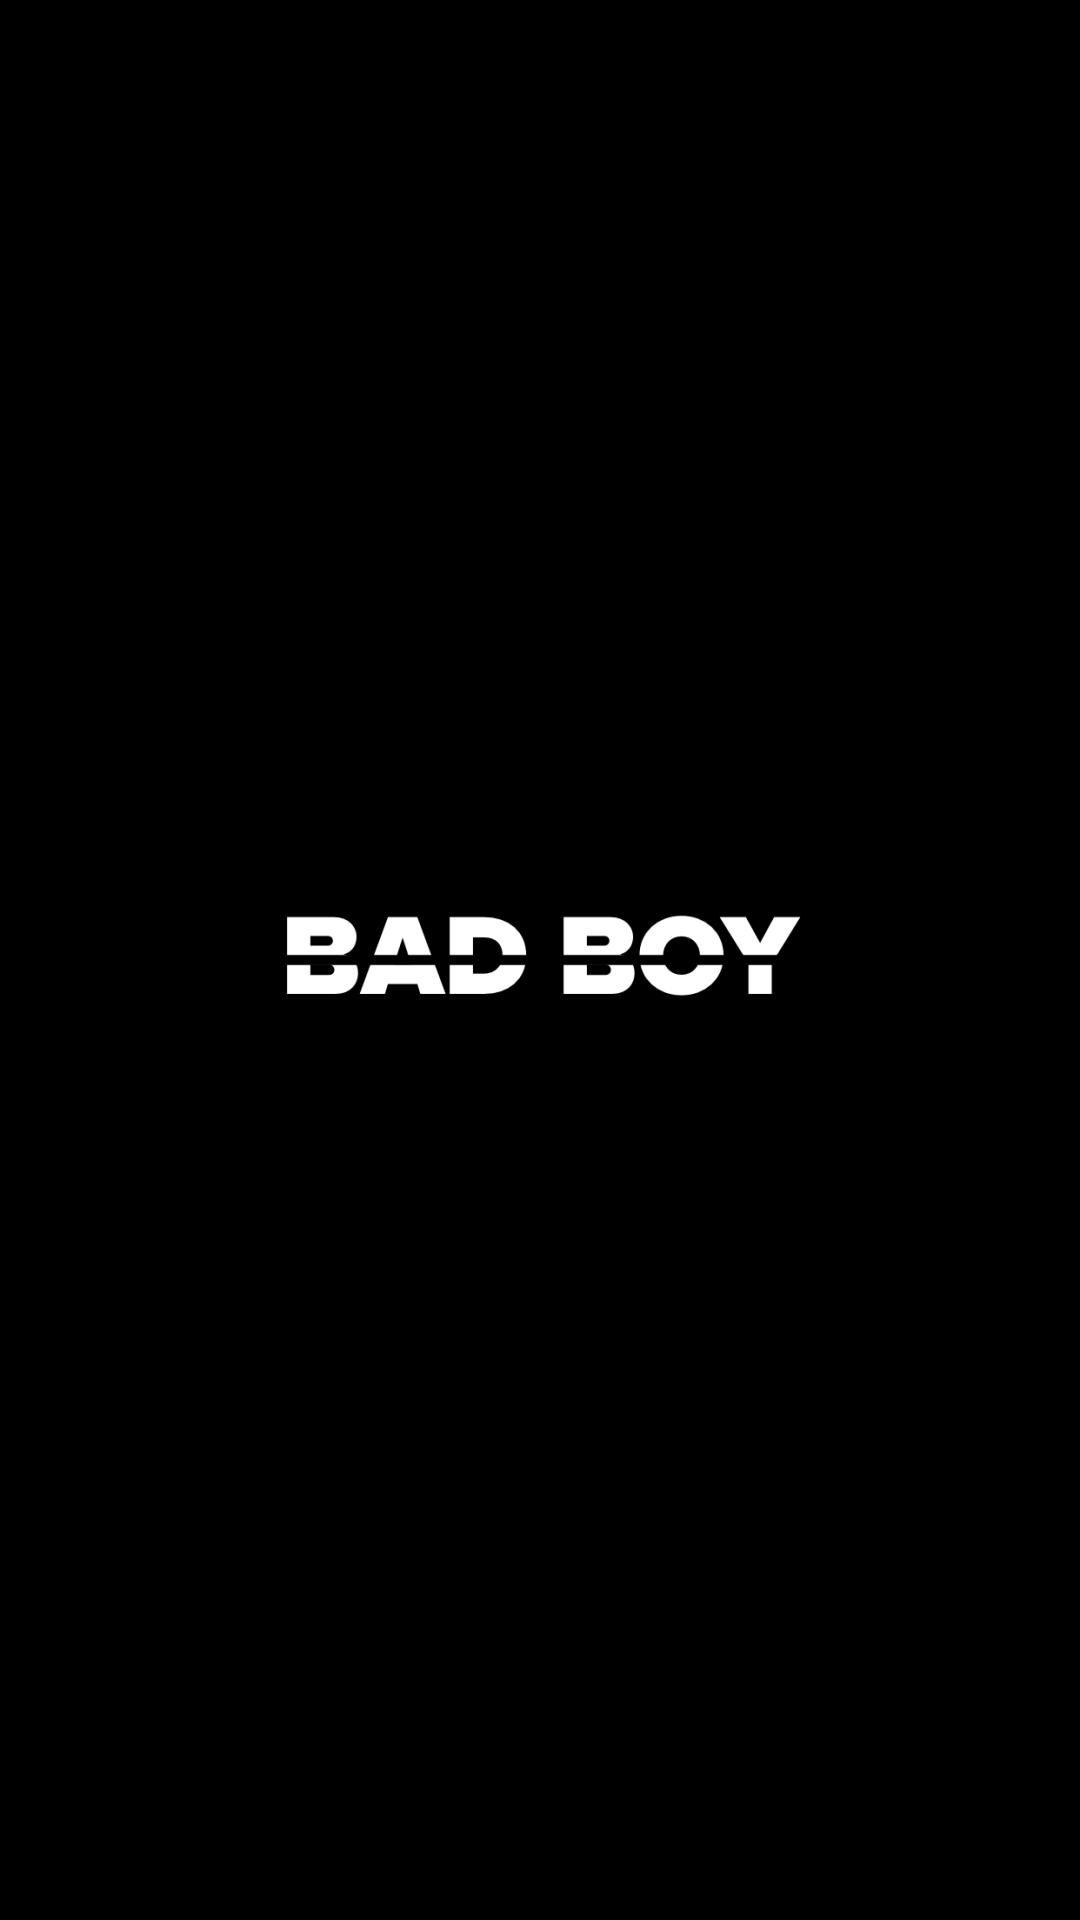 Bad Boy Bad Boy Redvelvet Boys Wallpaper Bad Boys Tumblr Hd Cool Wallpapers